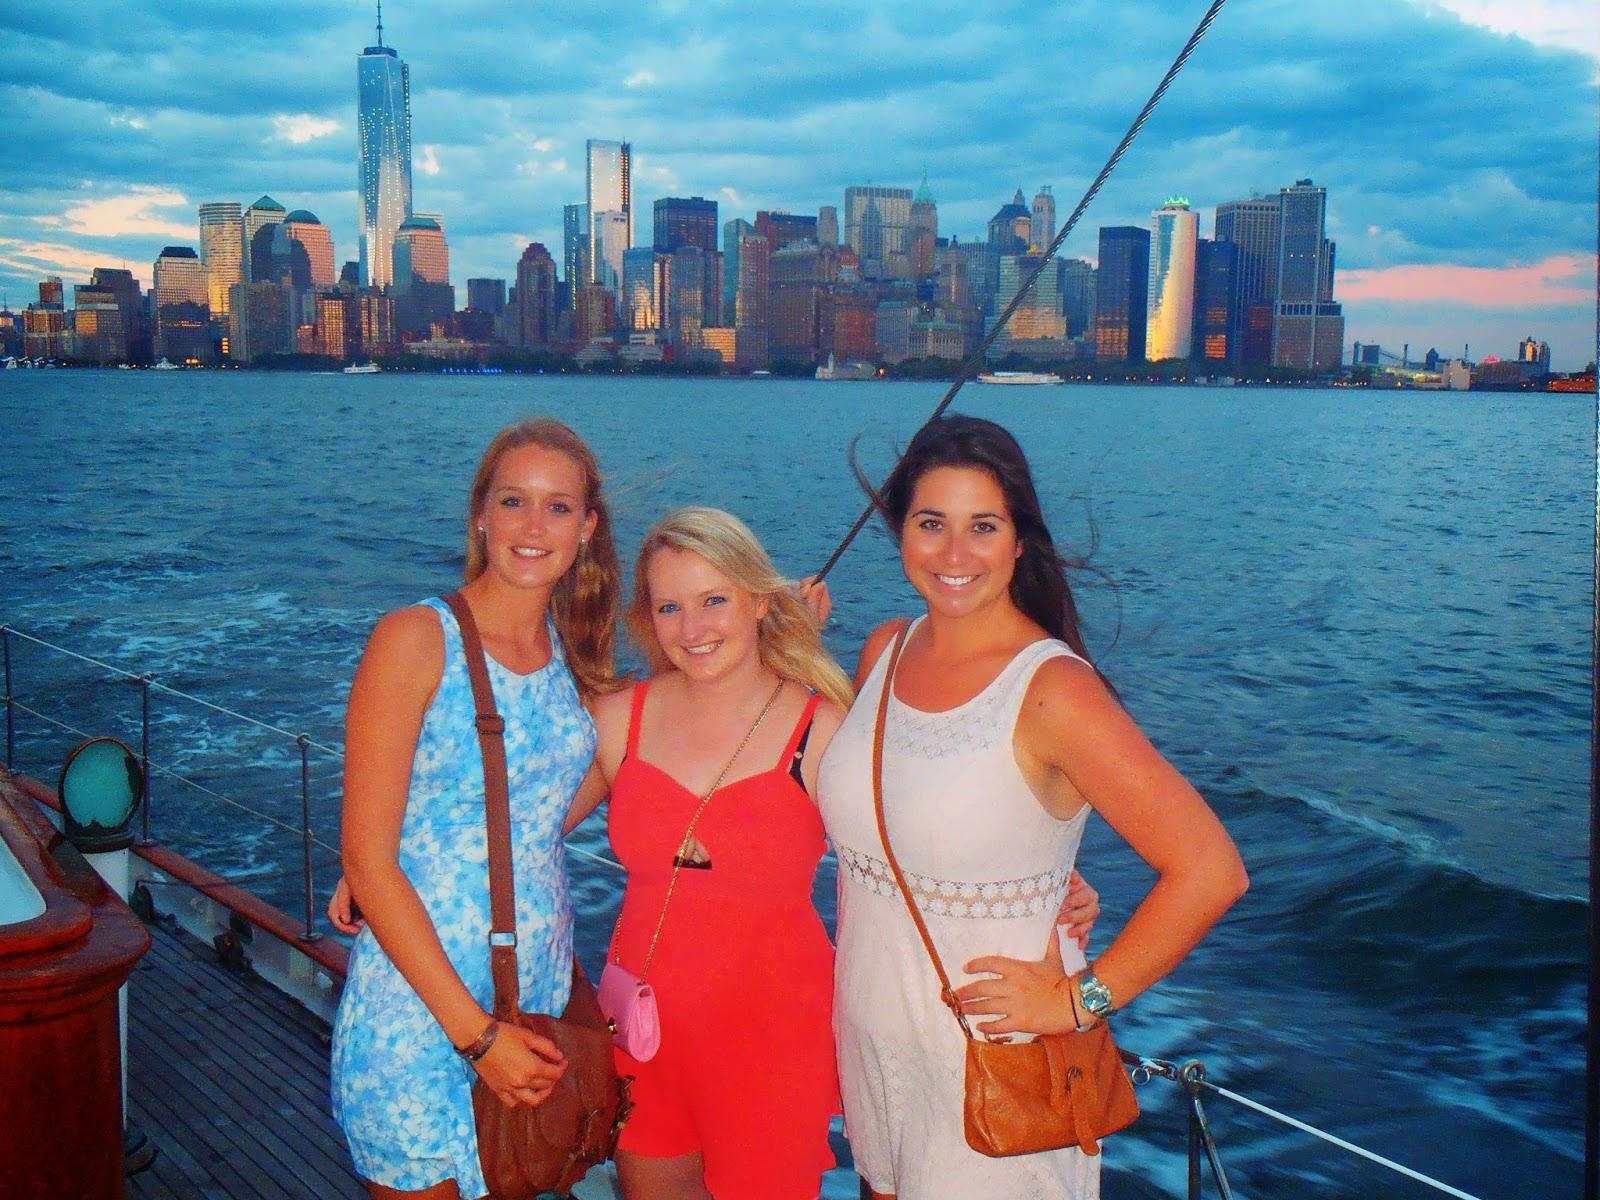 Girls sailing in New York city